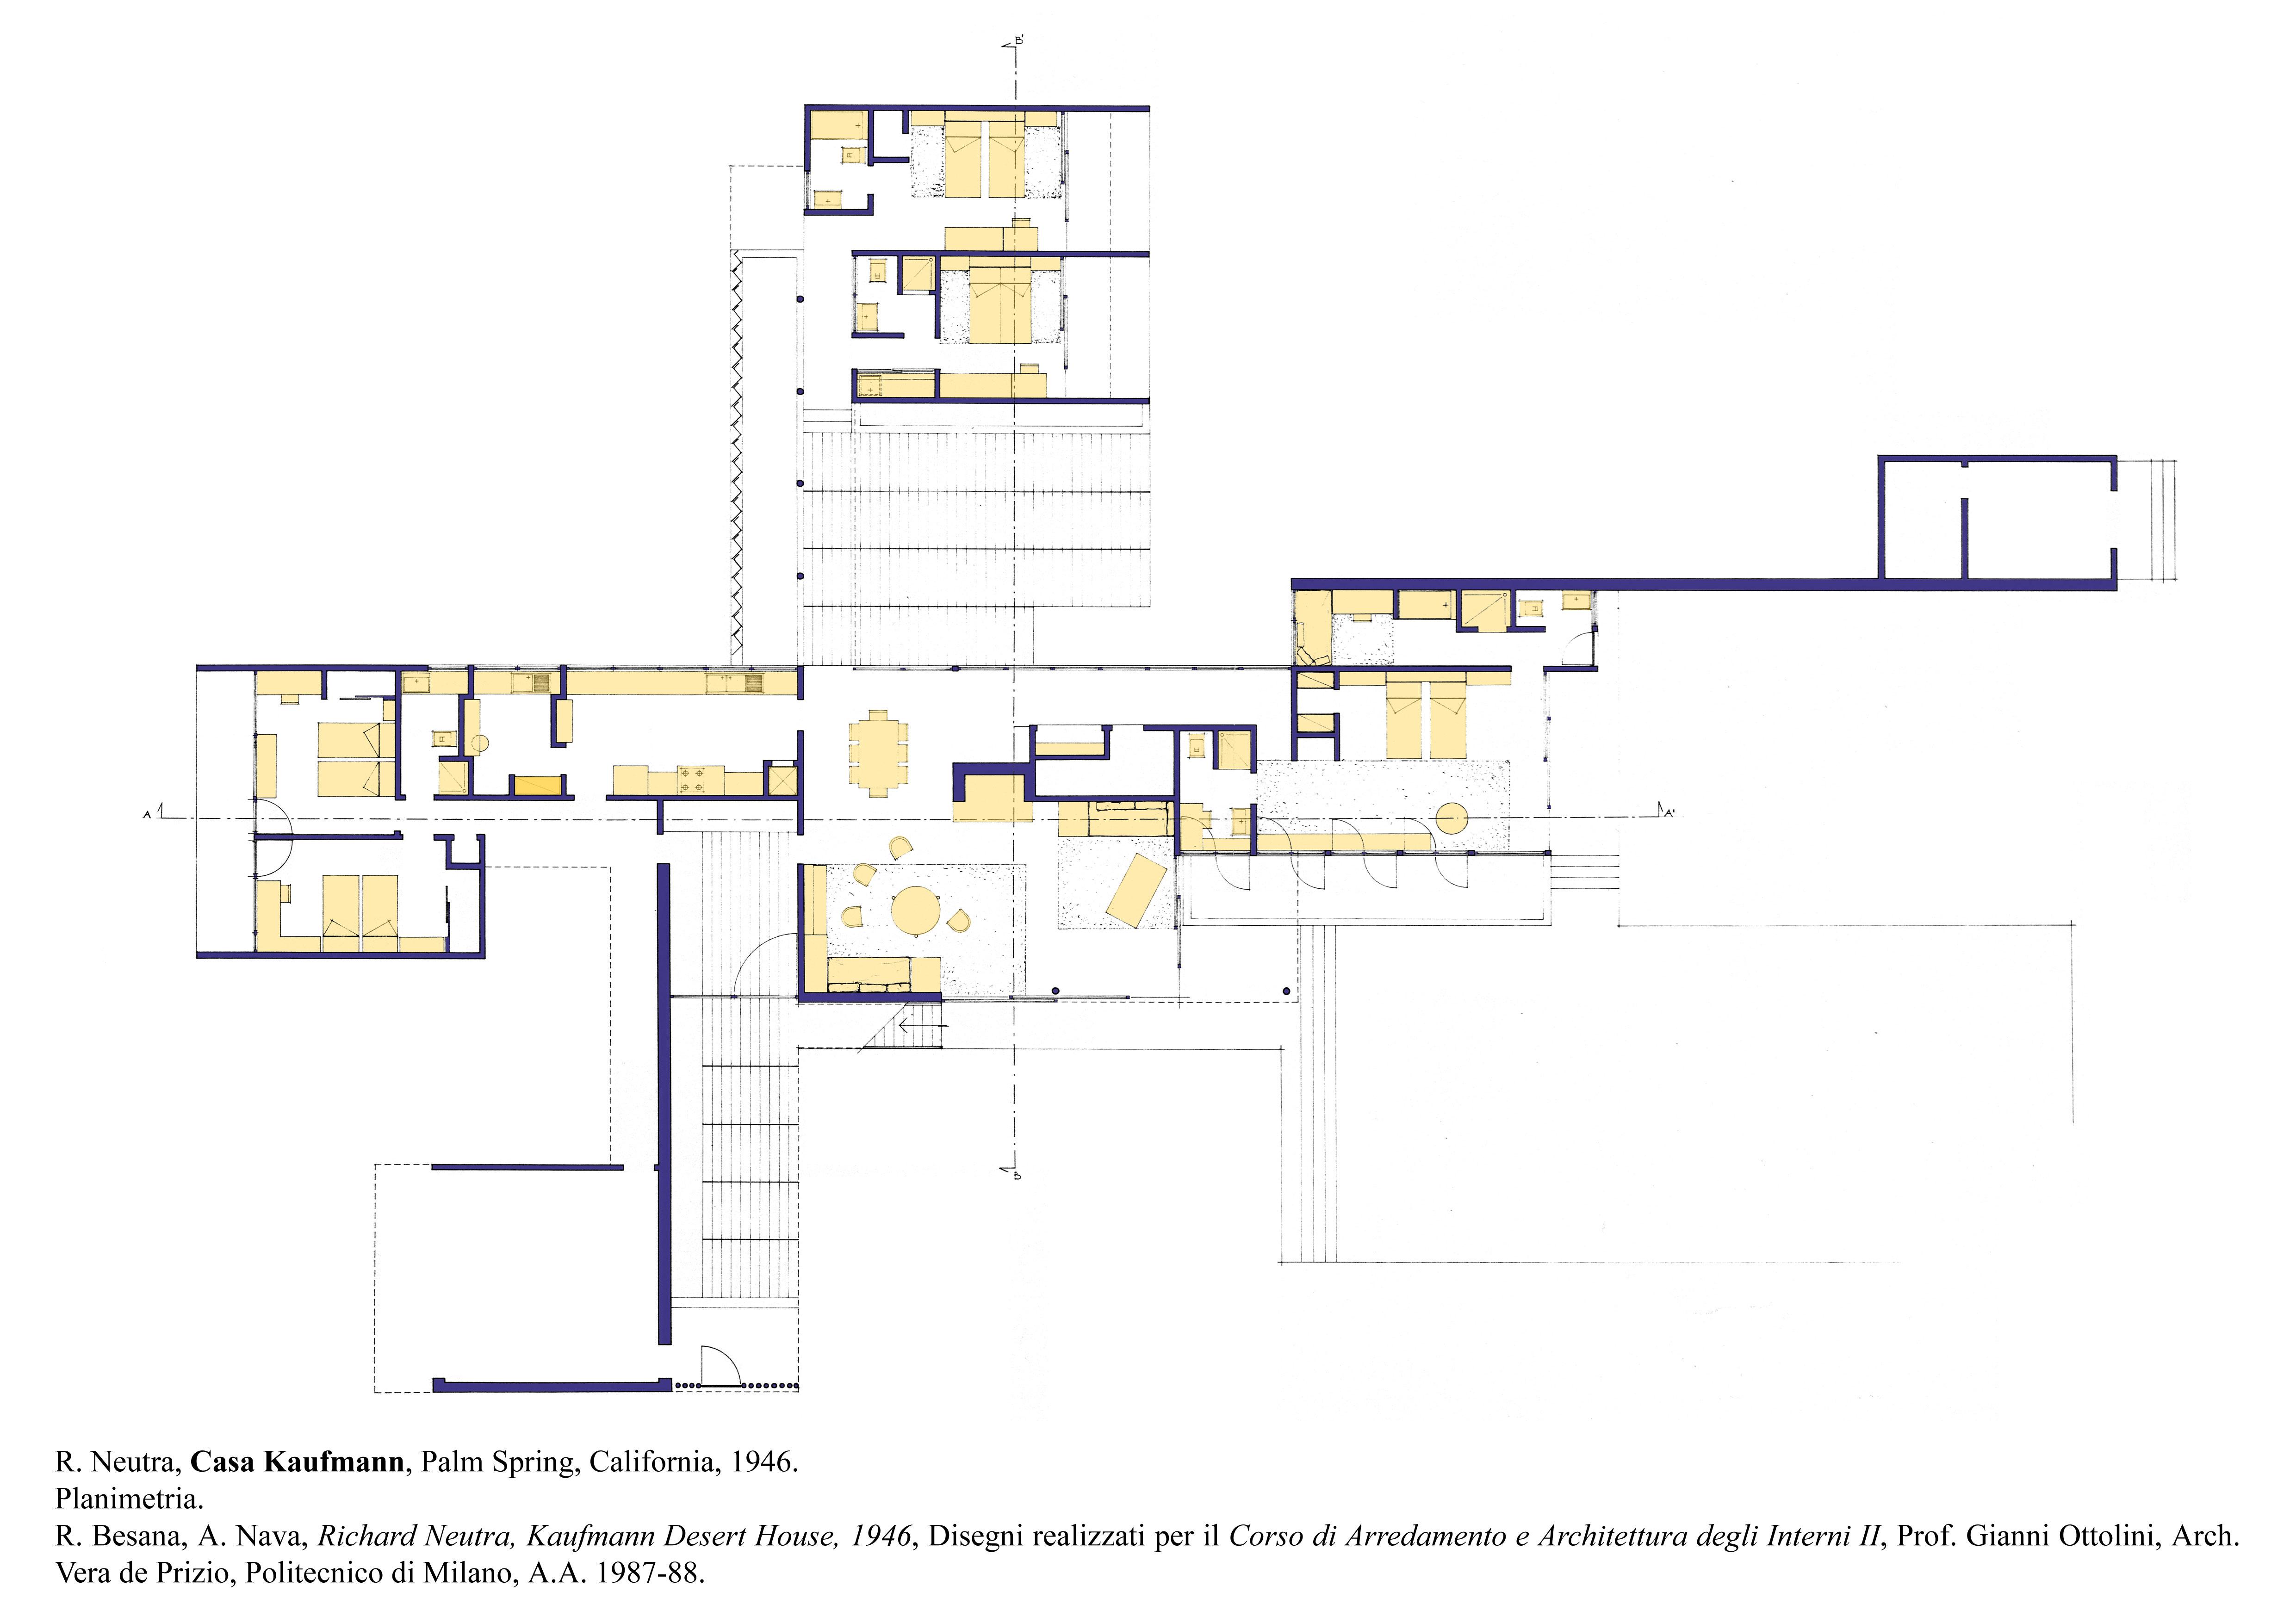 Planimetria Casa Con Misure archidiap » casa kaufmann